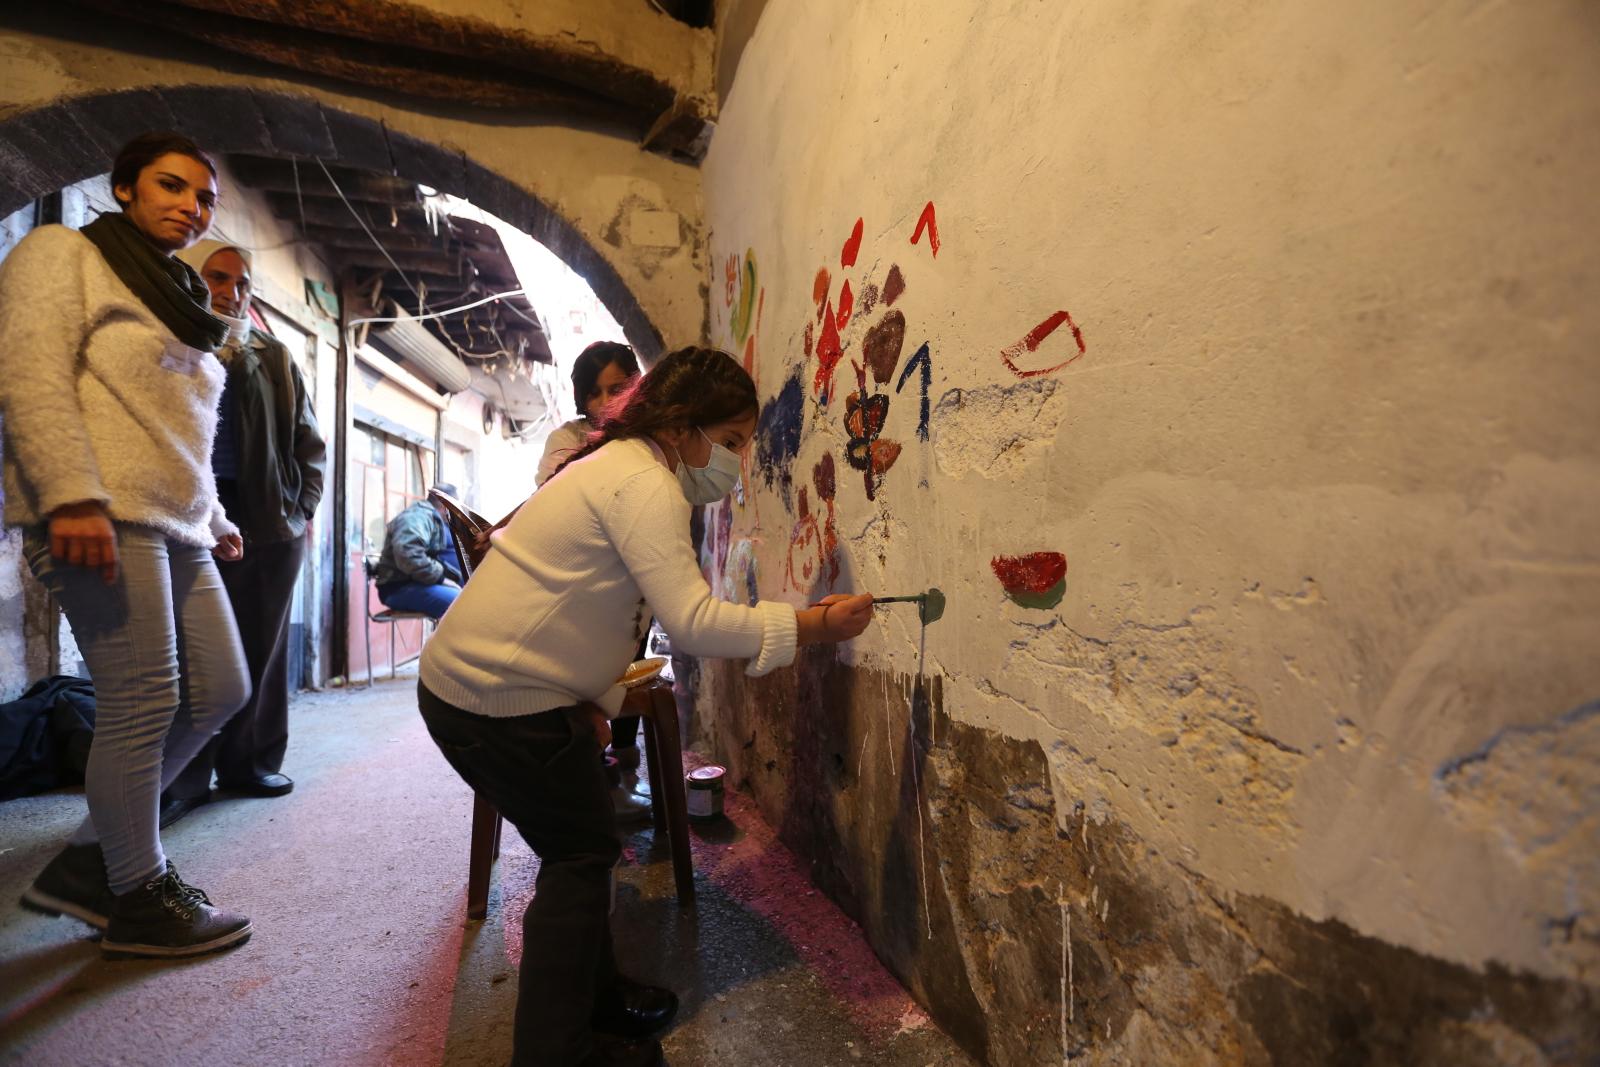 Arte callejero en las calles de Damasco, Foto: EPA / YOUSSEF BADAWI